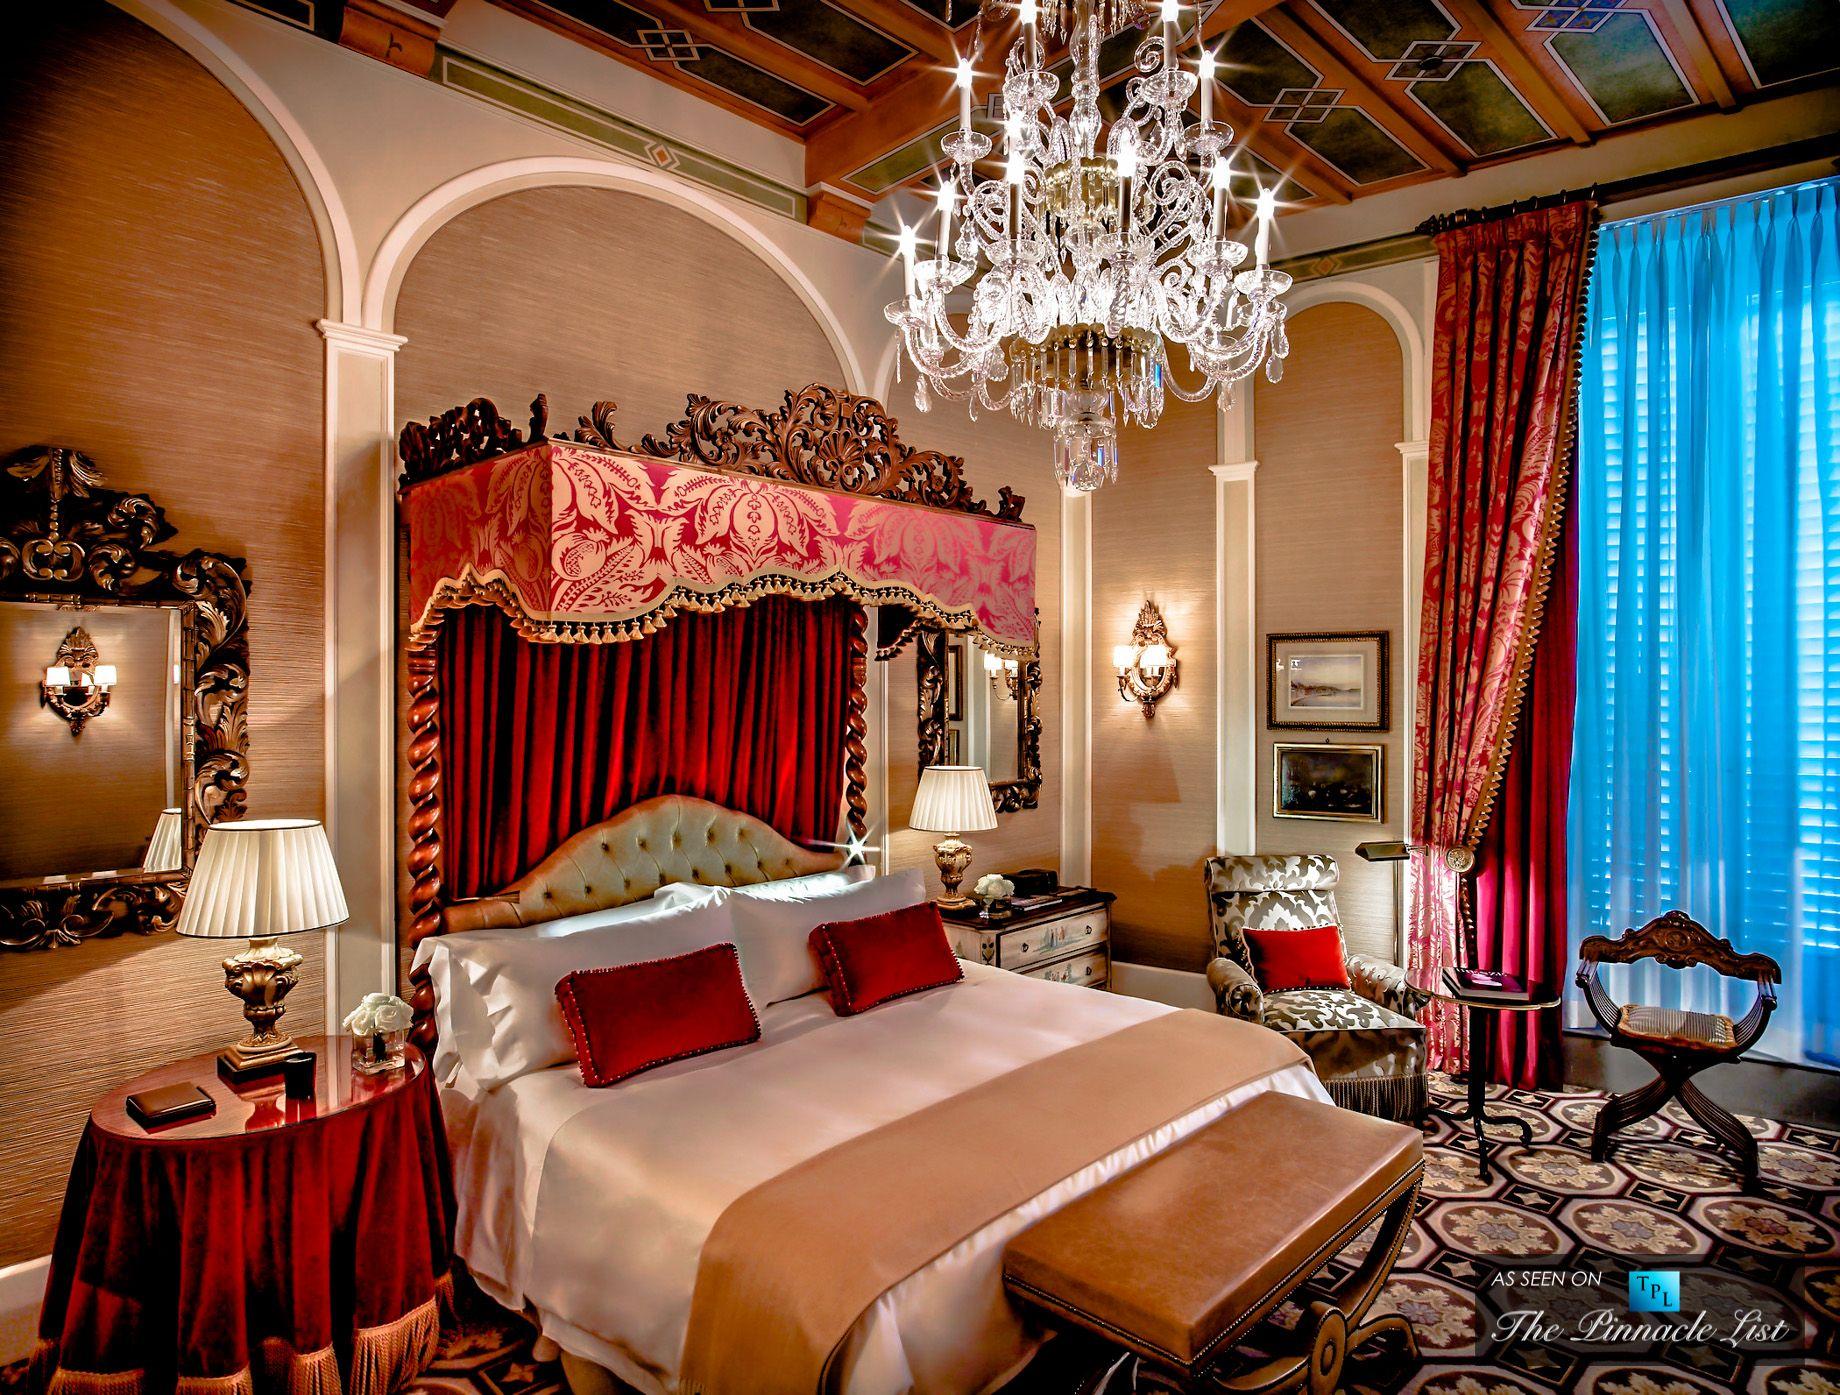 St regis luxury hotel florence italy premium deluxe renaissance style